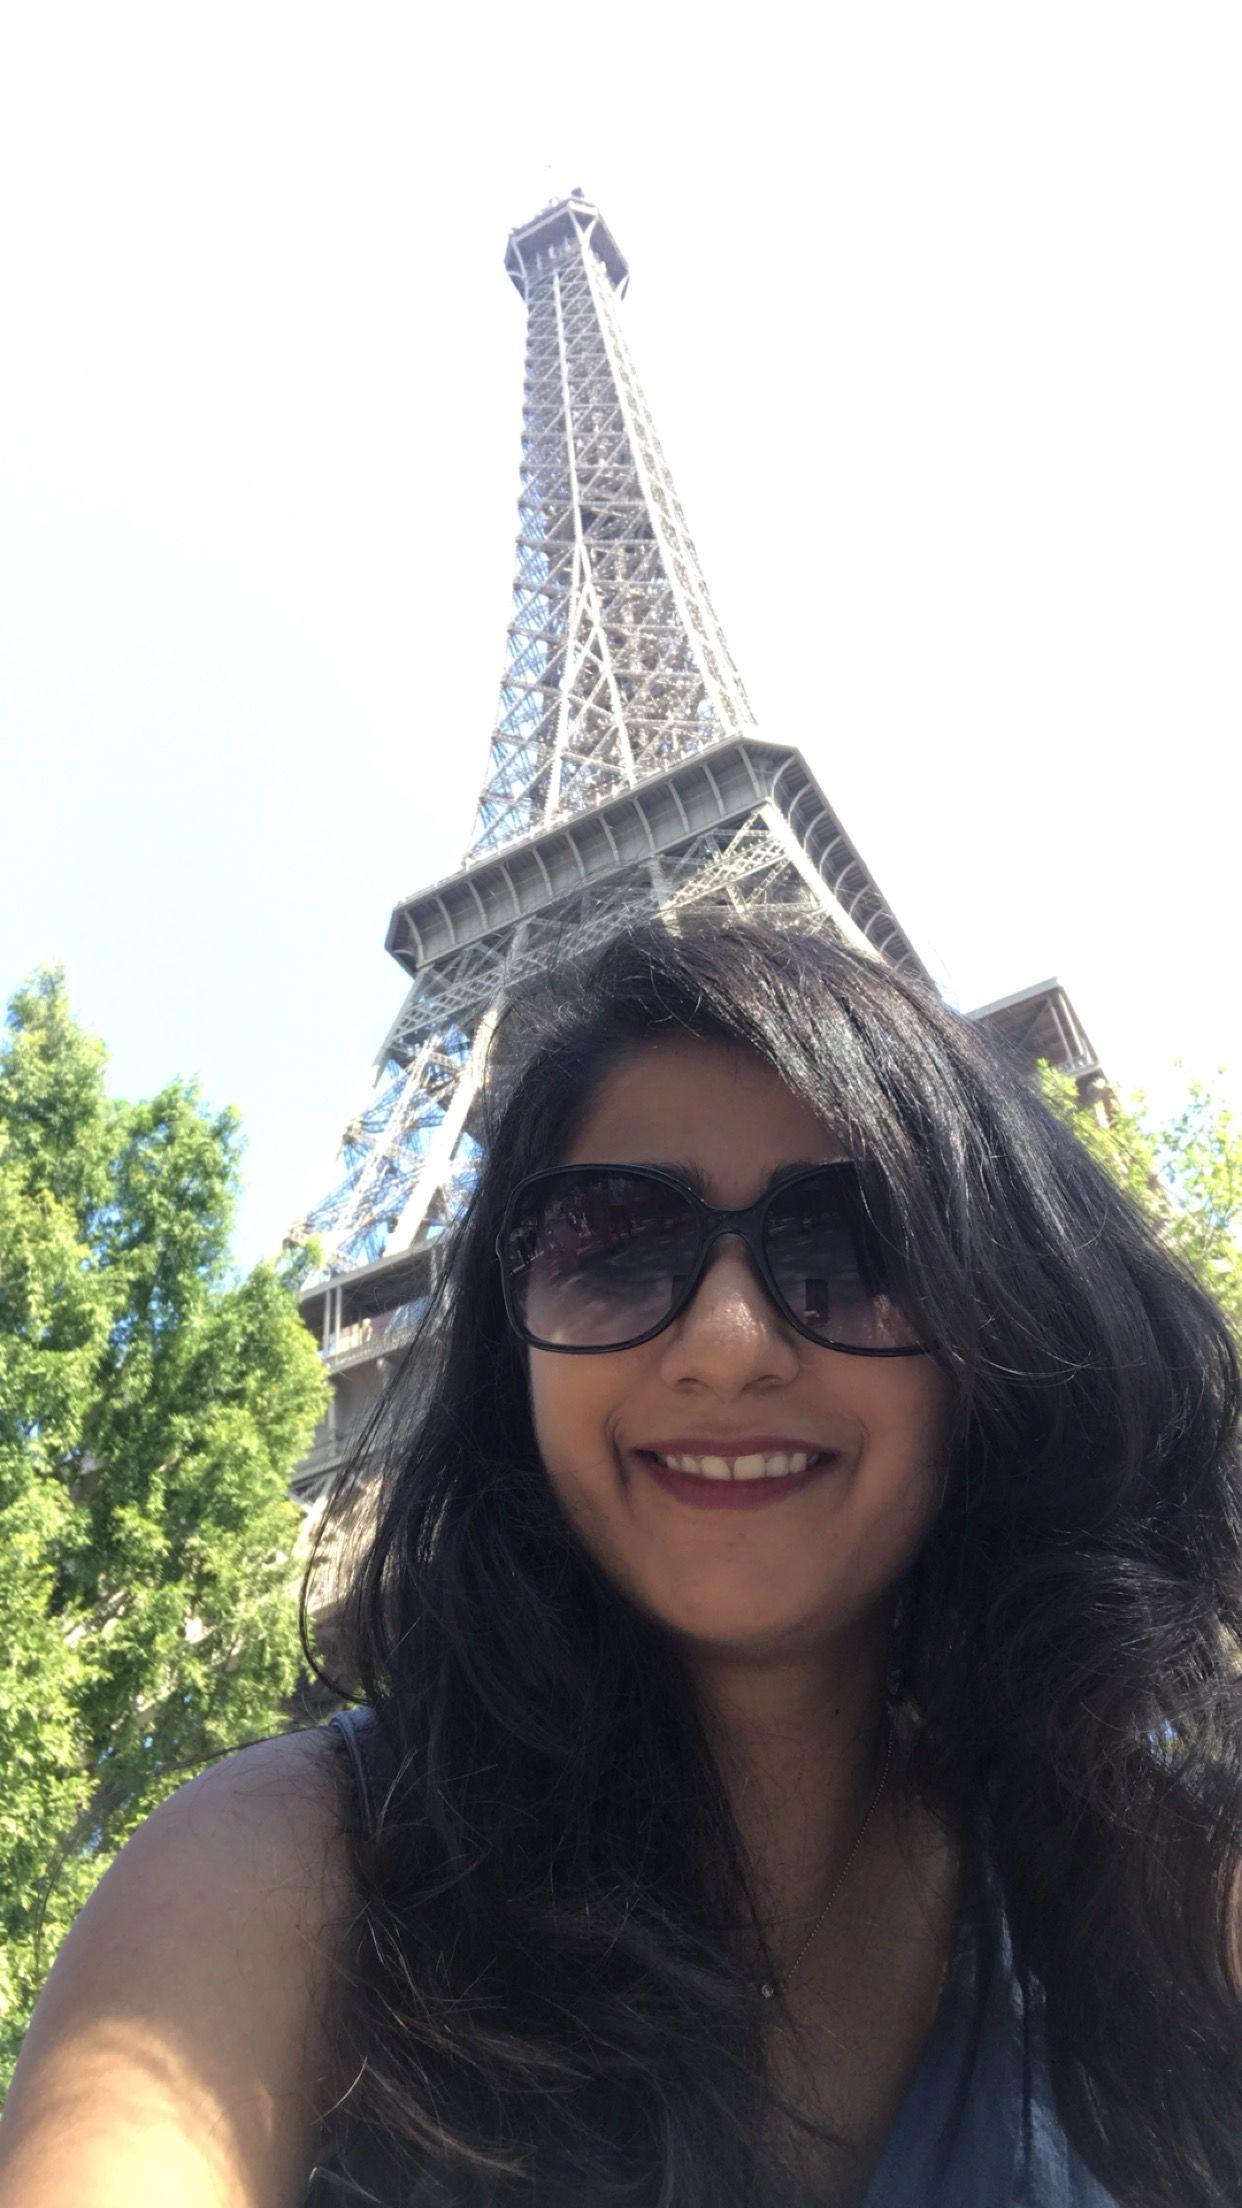 Photo of Eiffel Tower By Noopur Dedhia